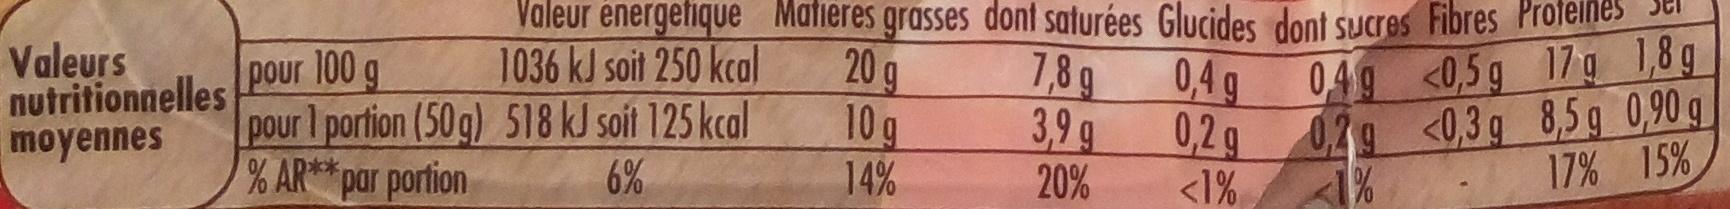 Lardons fumés (-25 % de sel) - Informazioni nutrizionali - fr